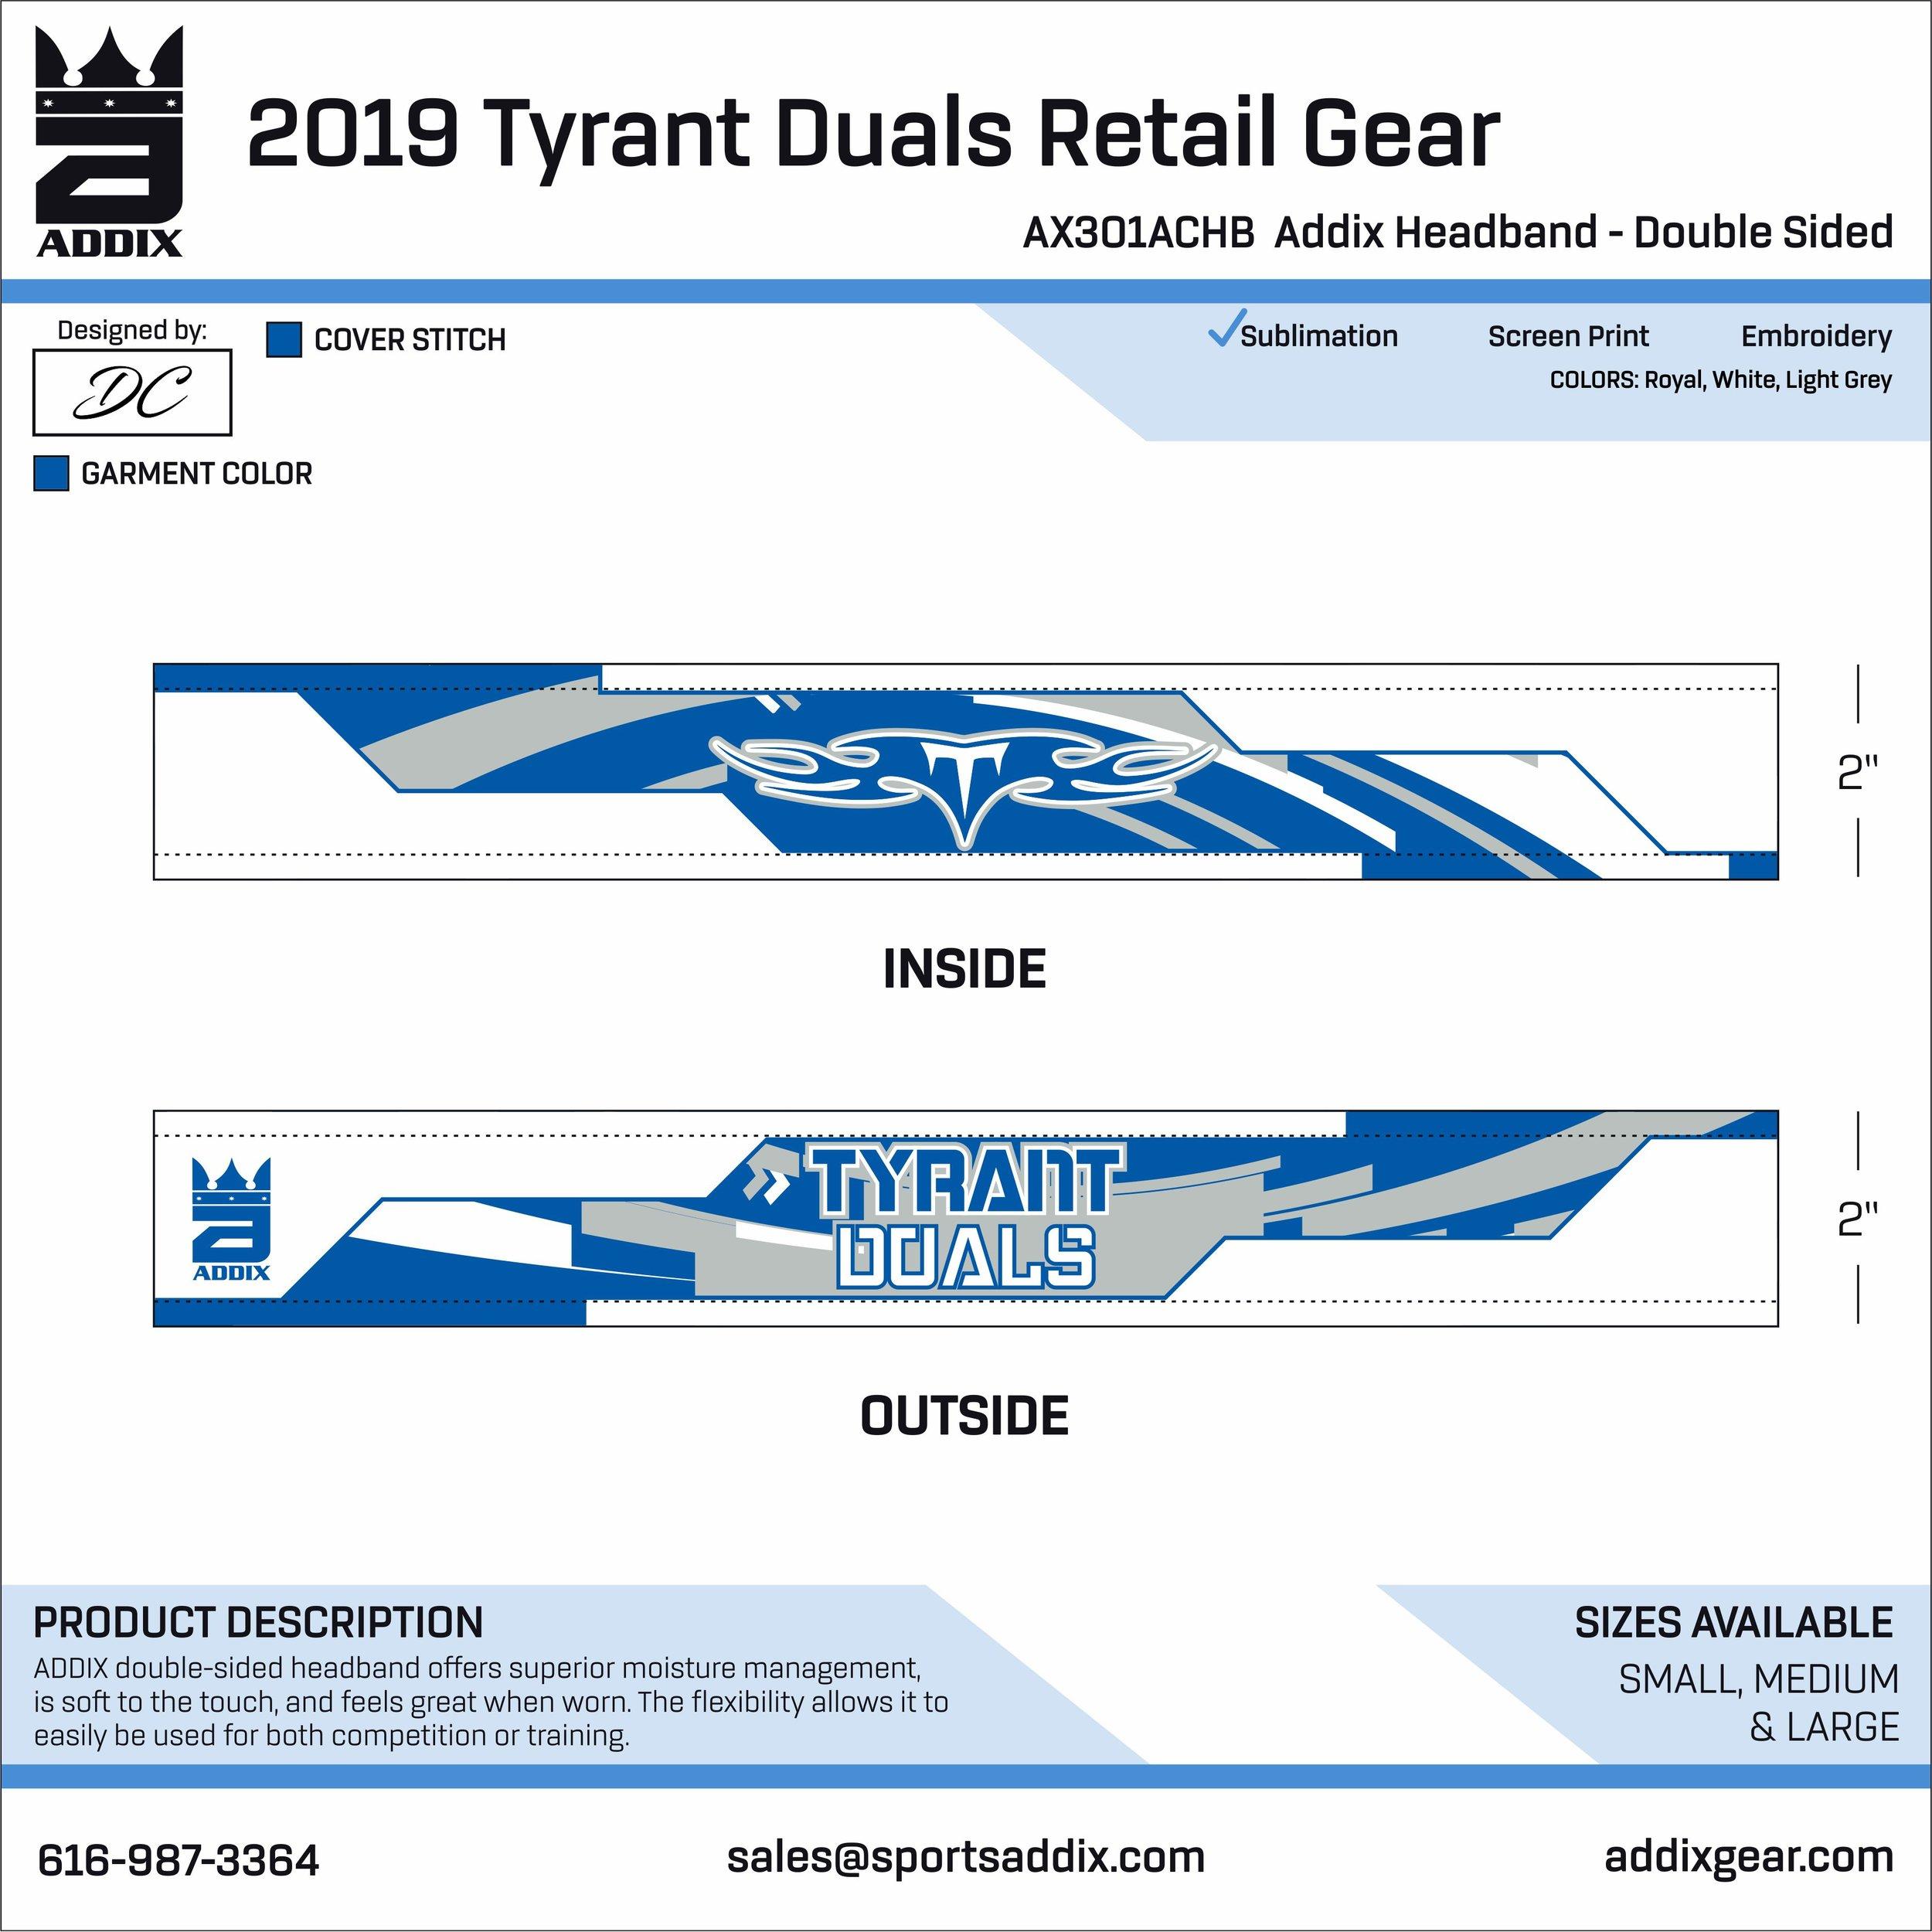 2019 Tyrant Duals Retail Gear_2018_12-18_DC_Headband.jpg